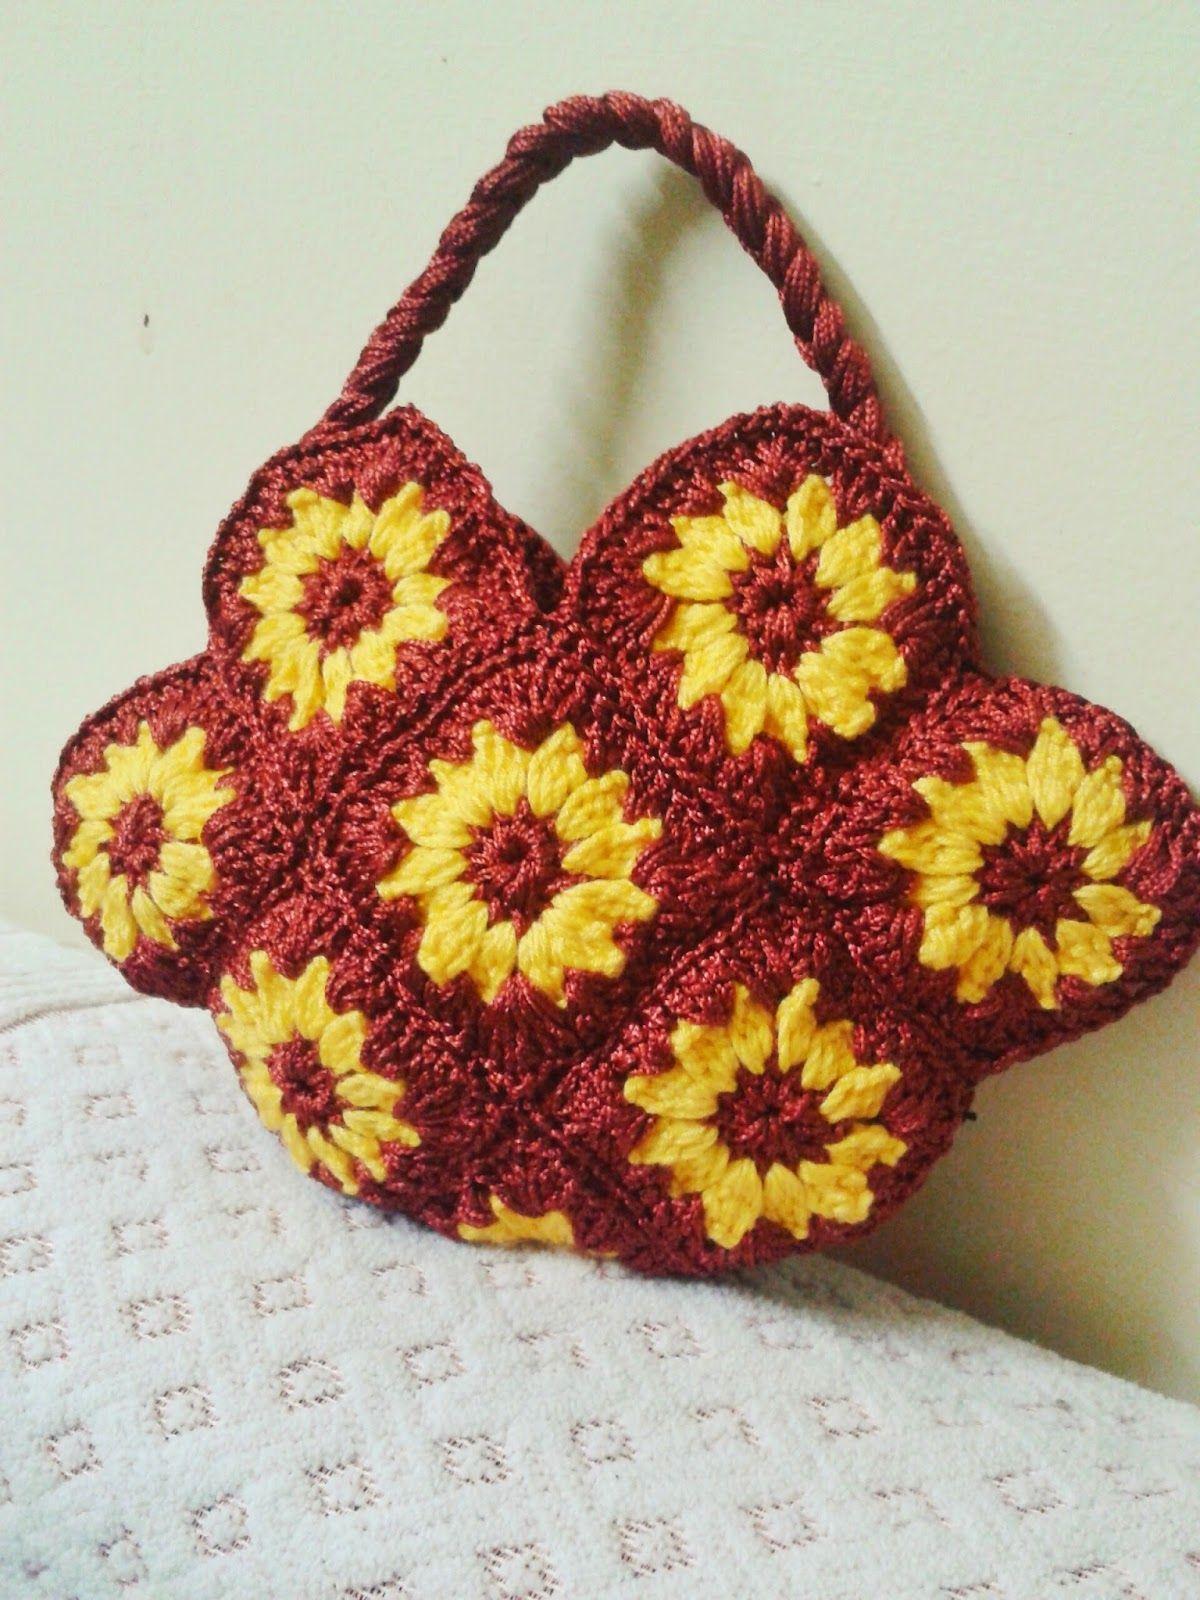 crochet bag | crochet | Pinterest | Crocheted bags, Crochet and ...